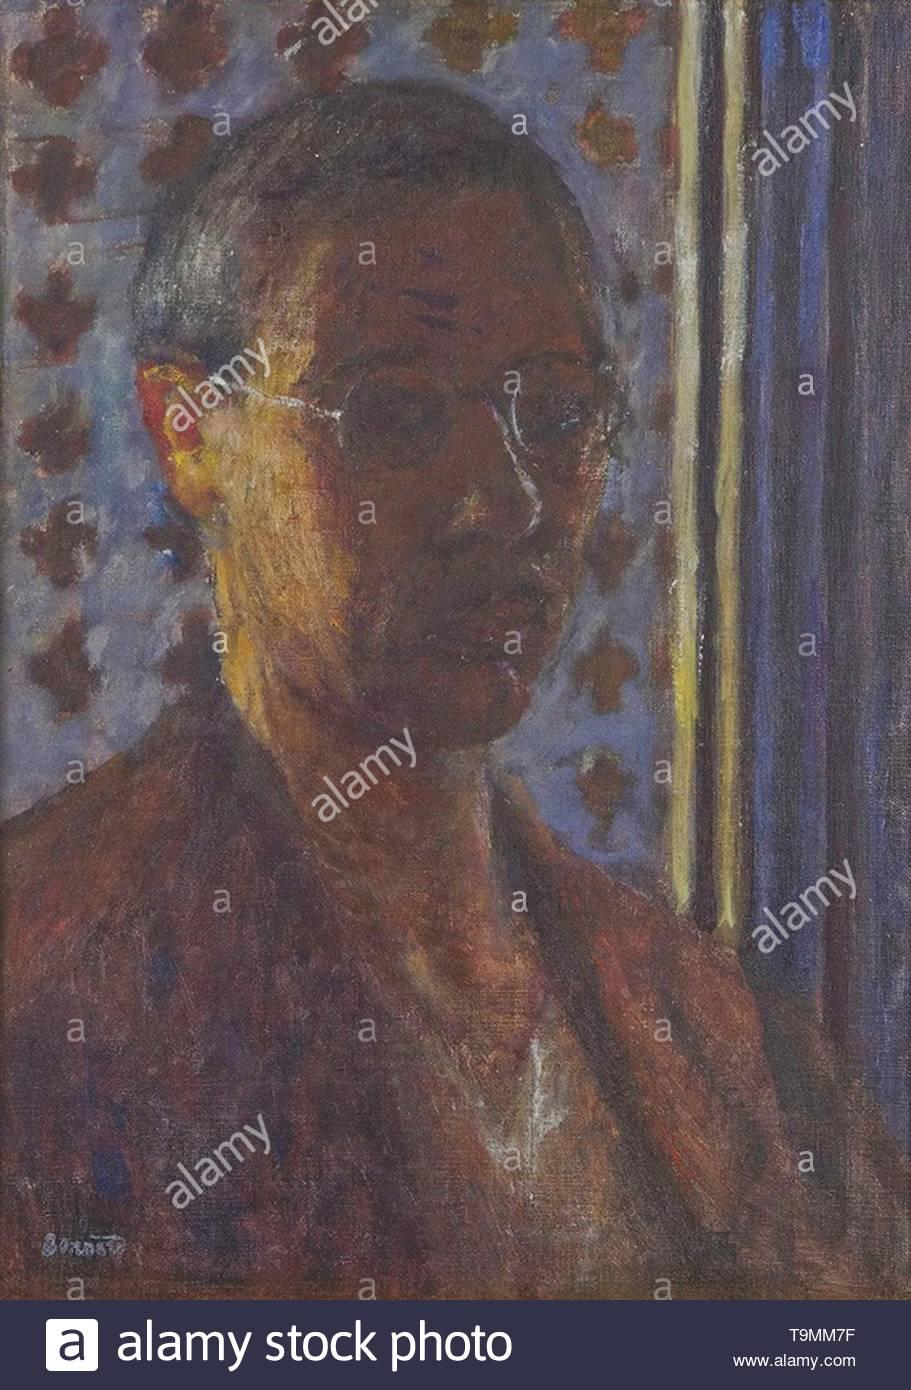 Self-Portrait. Museum: PRIVATE COLLECTION. Author: PIERRE BONNARD. - Stock Image